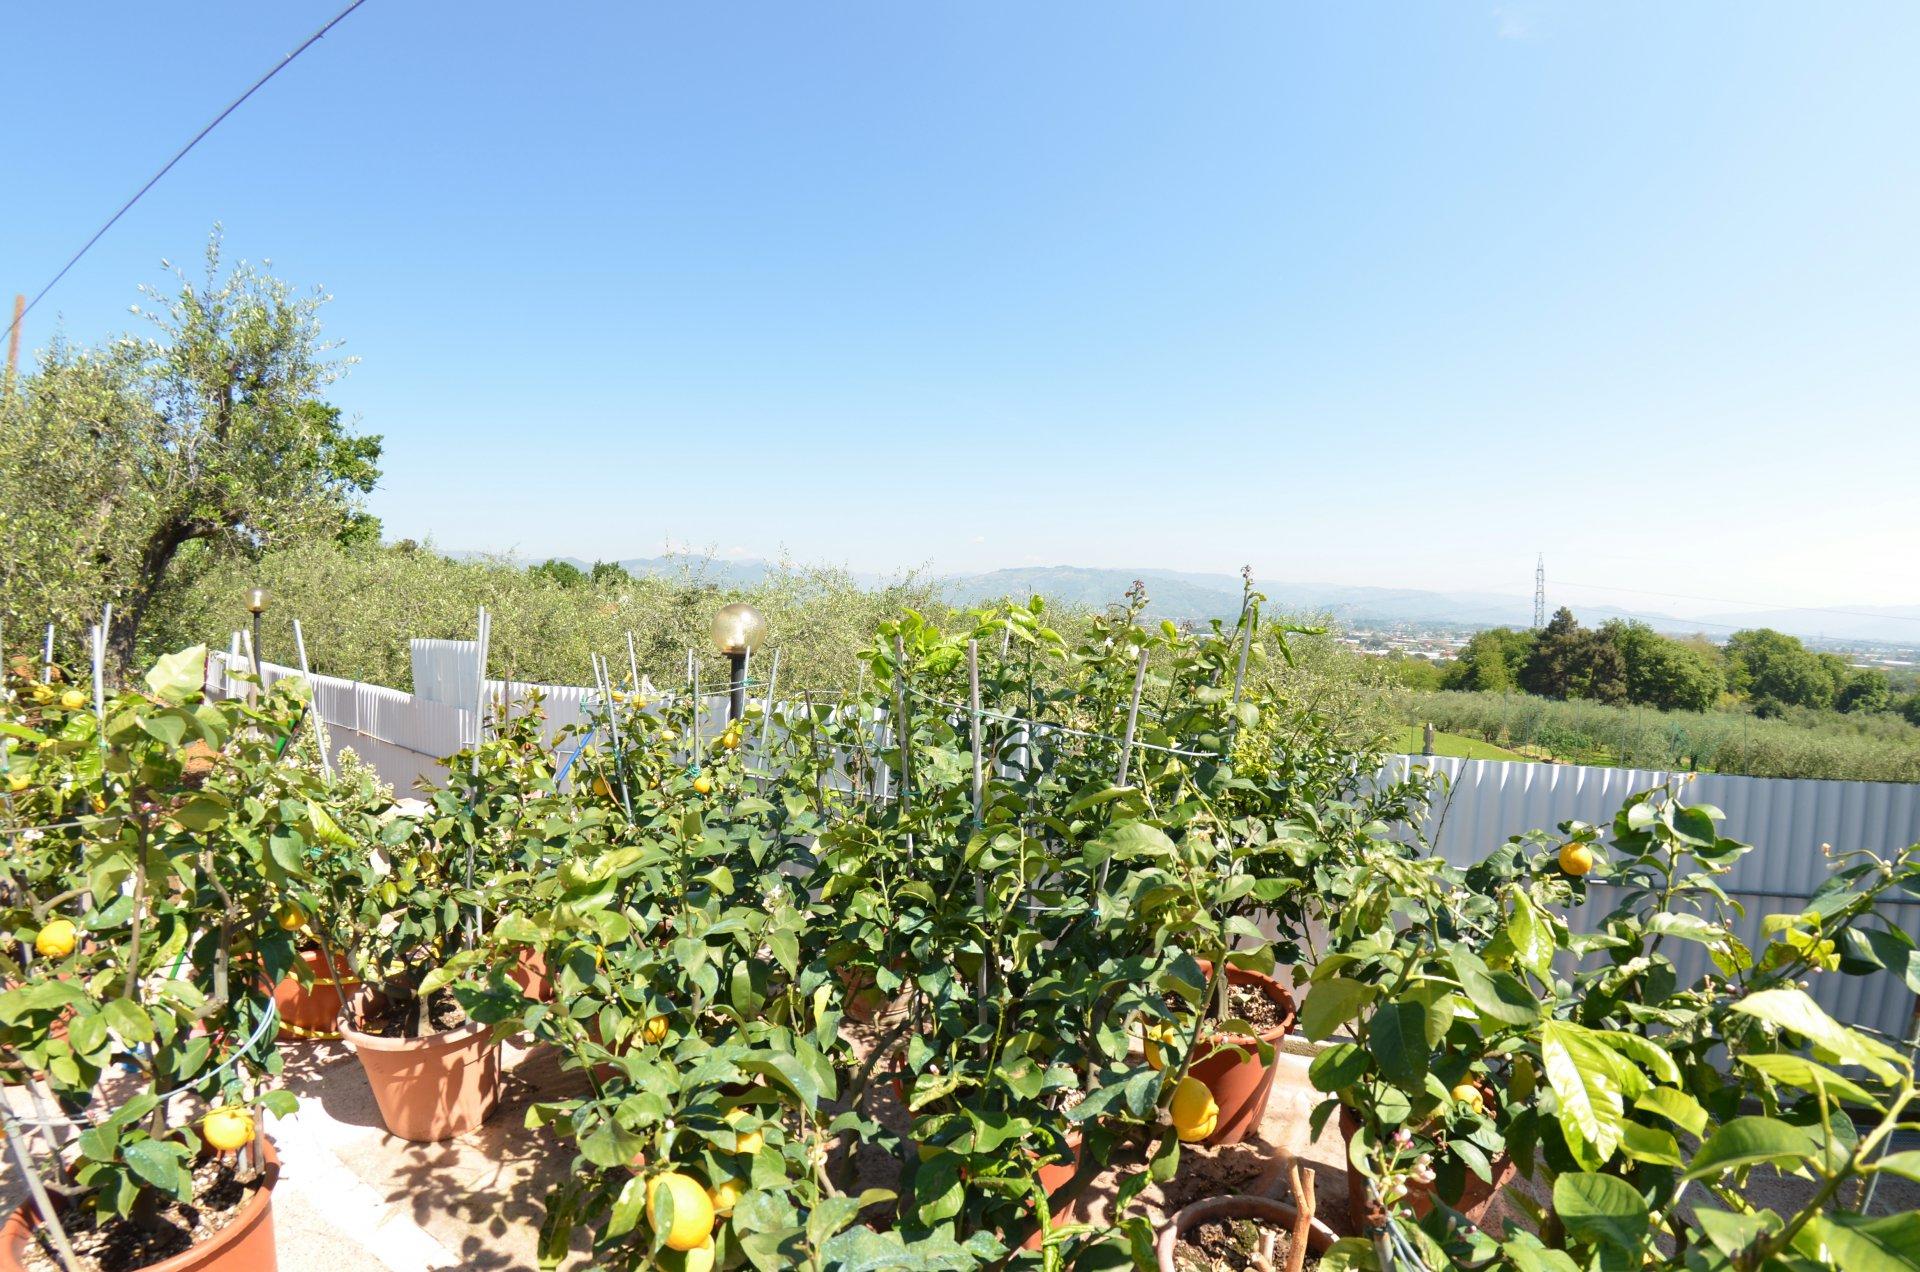 ITALIE, TOSCANE, GÎTE AVEC PISCINE, 6 PERSONNES, LUCCA